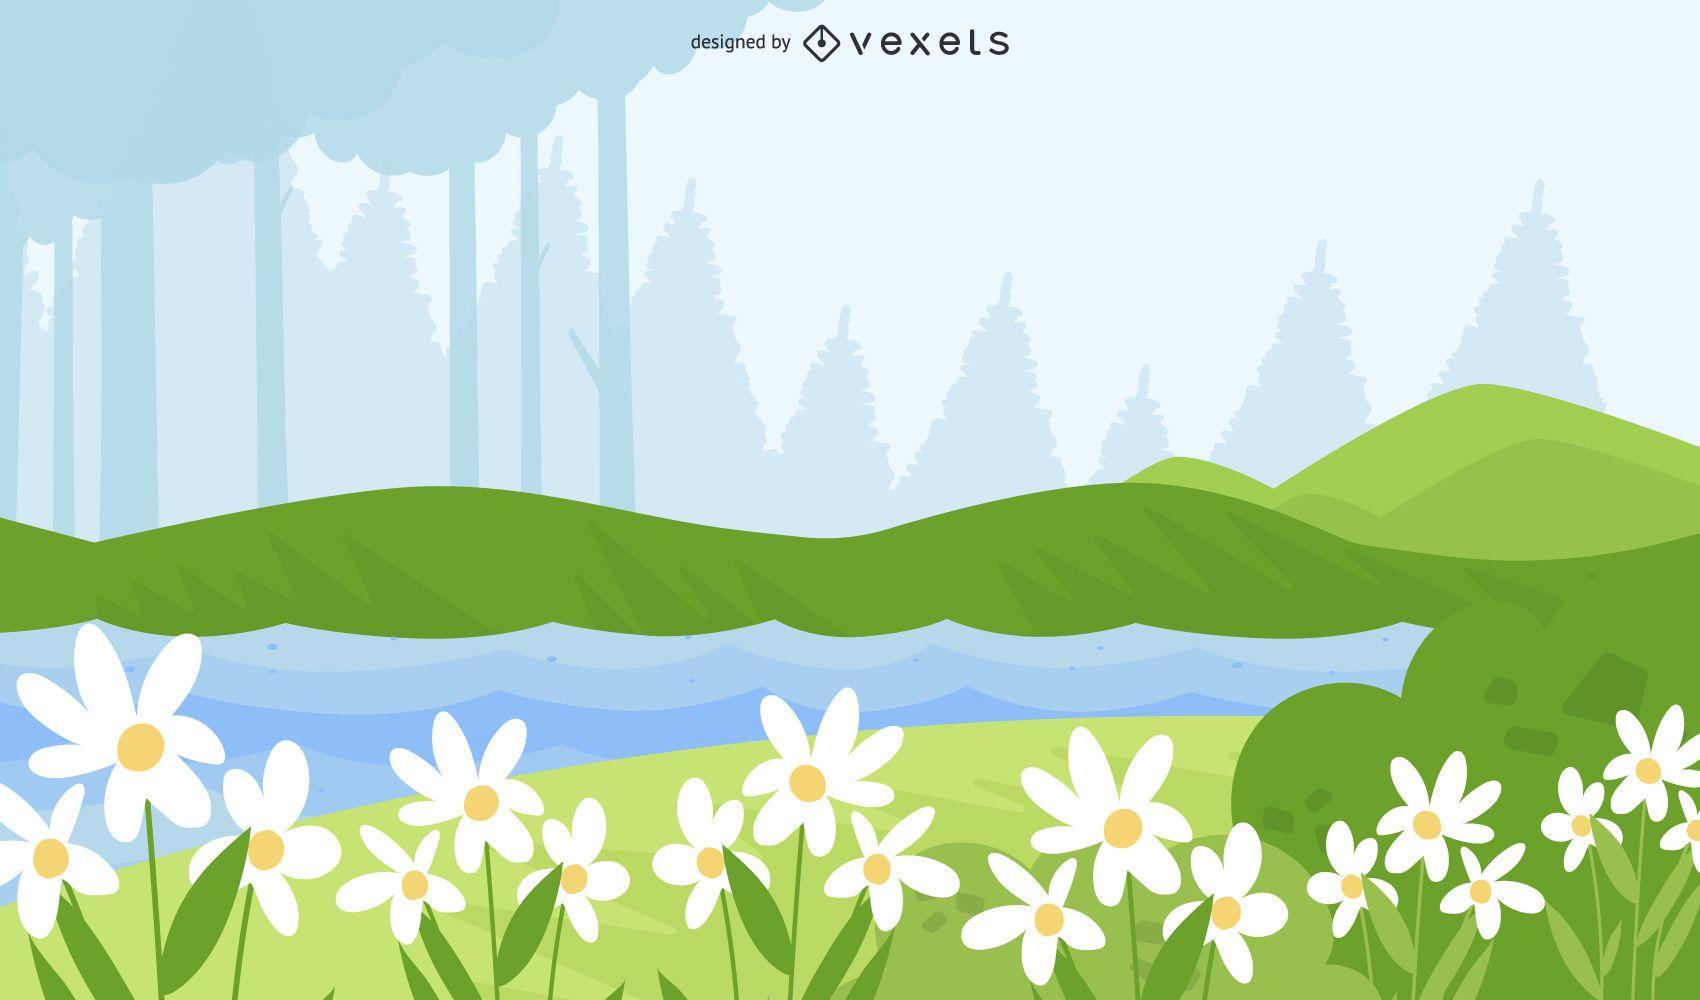 Flower Field illustration design